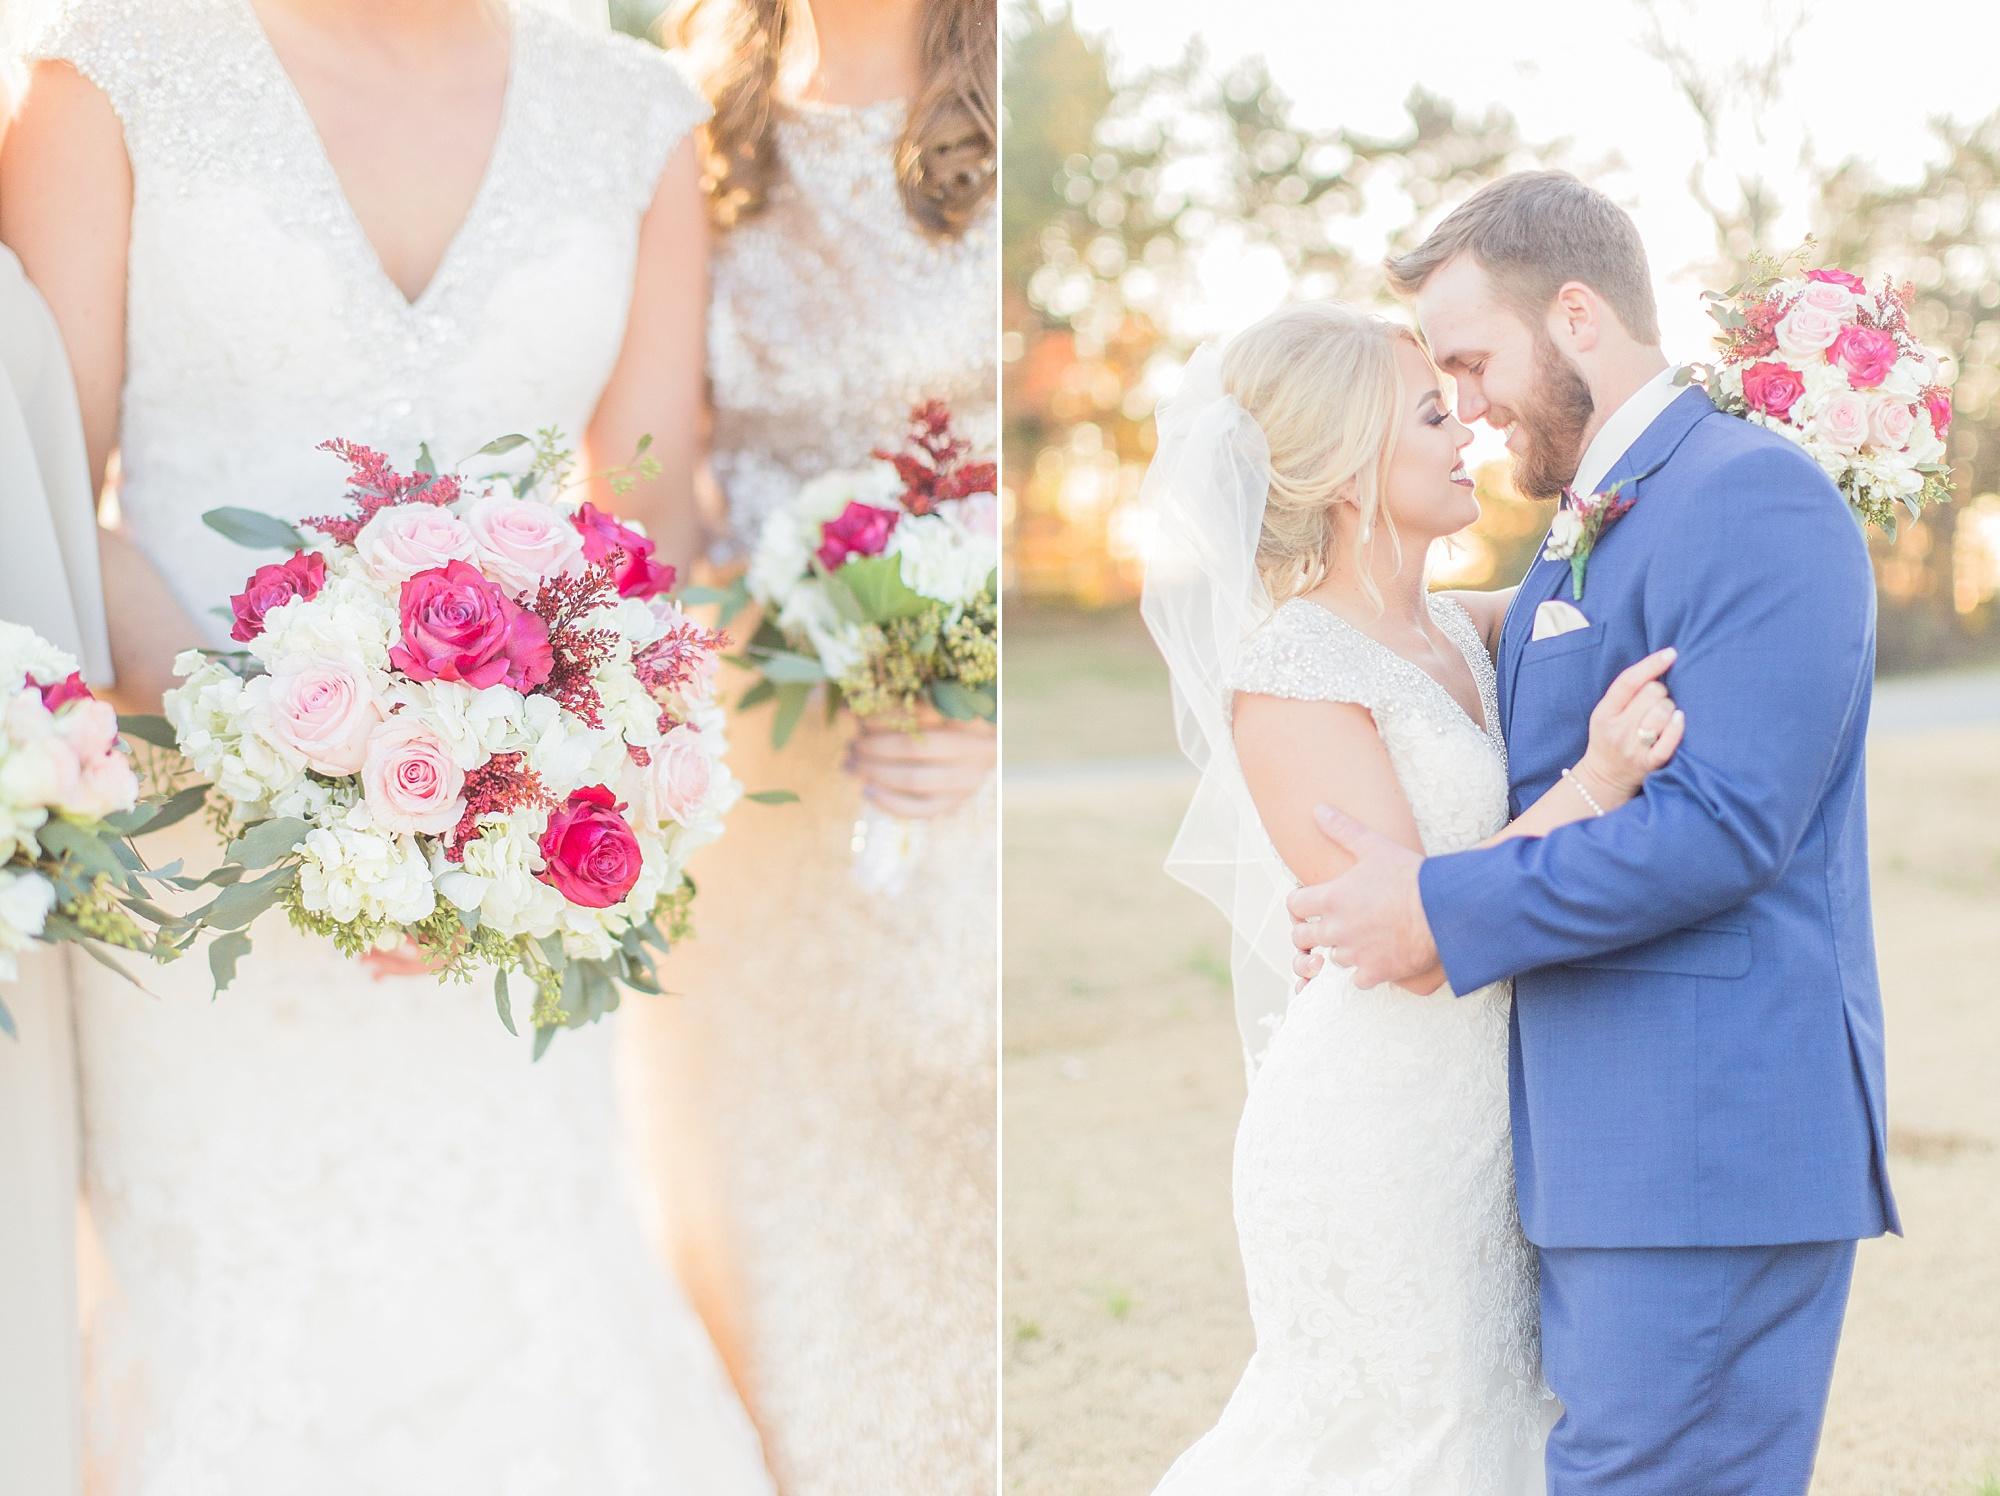 mississippi-wedding-photographer_0010.jpg